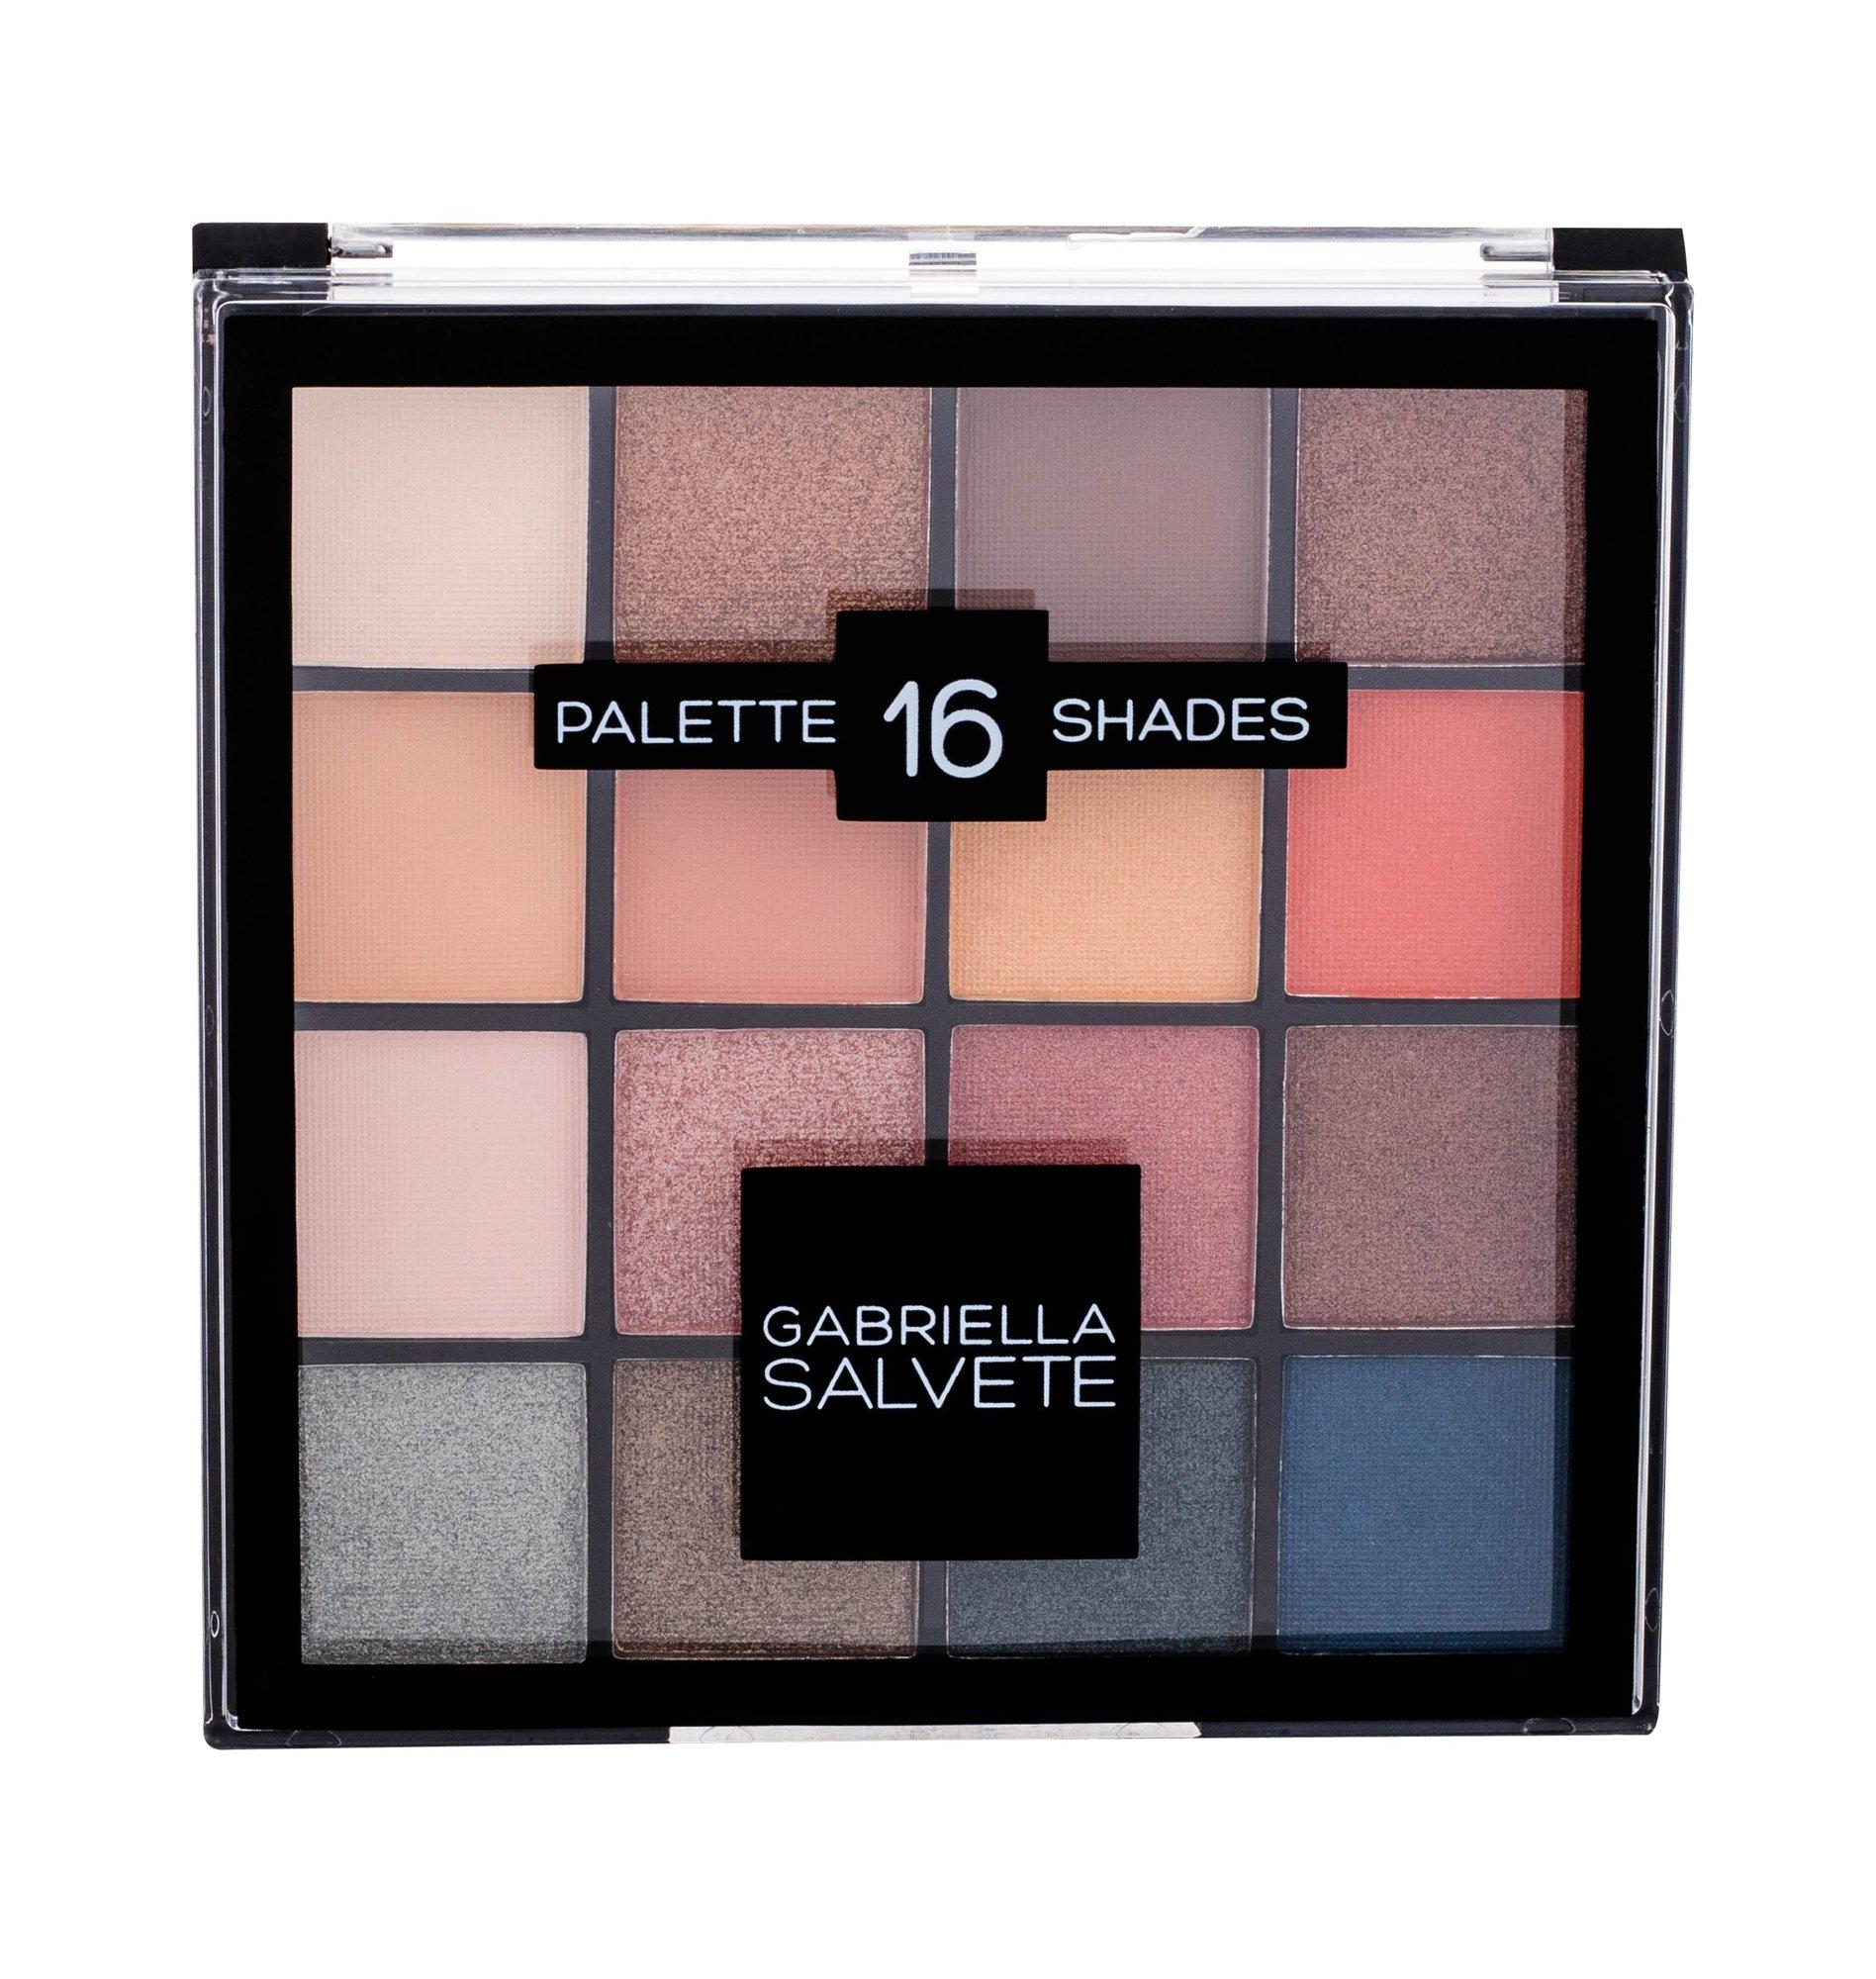 Gabriella Salvete Palette 16 Shades Eye Shadow 20,8ml